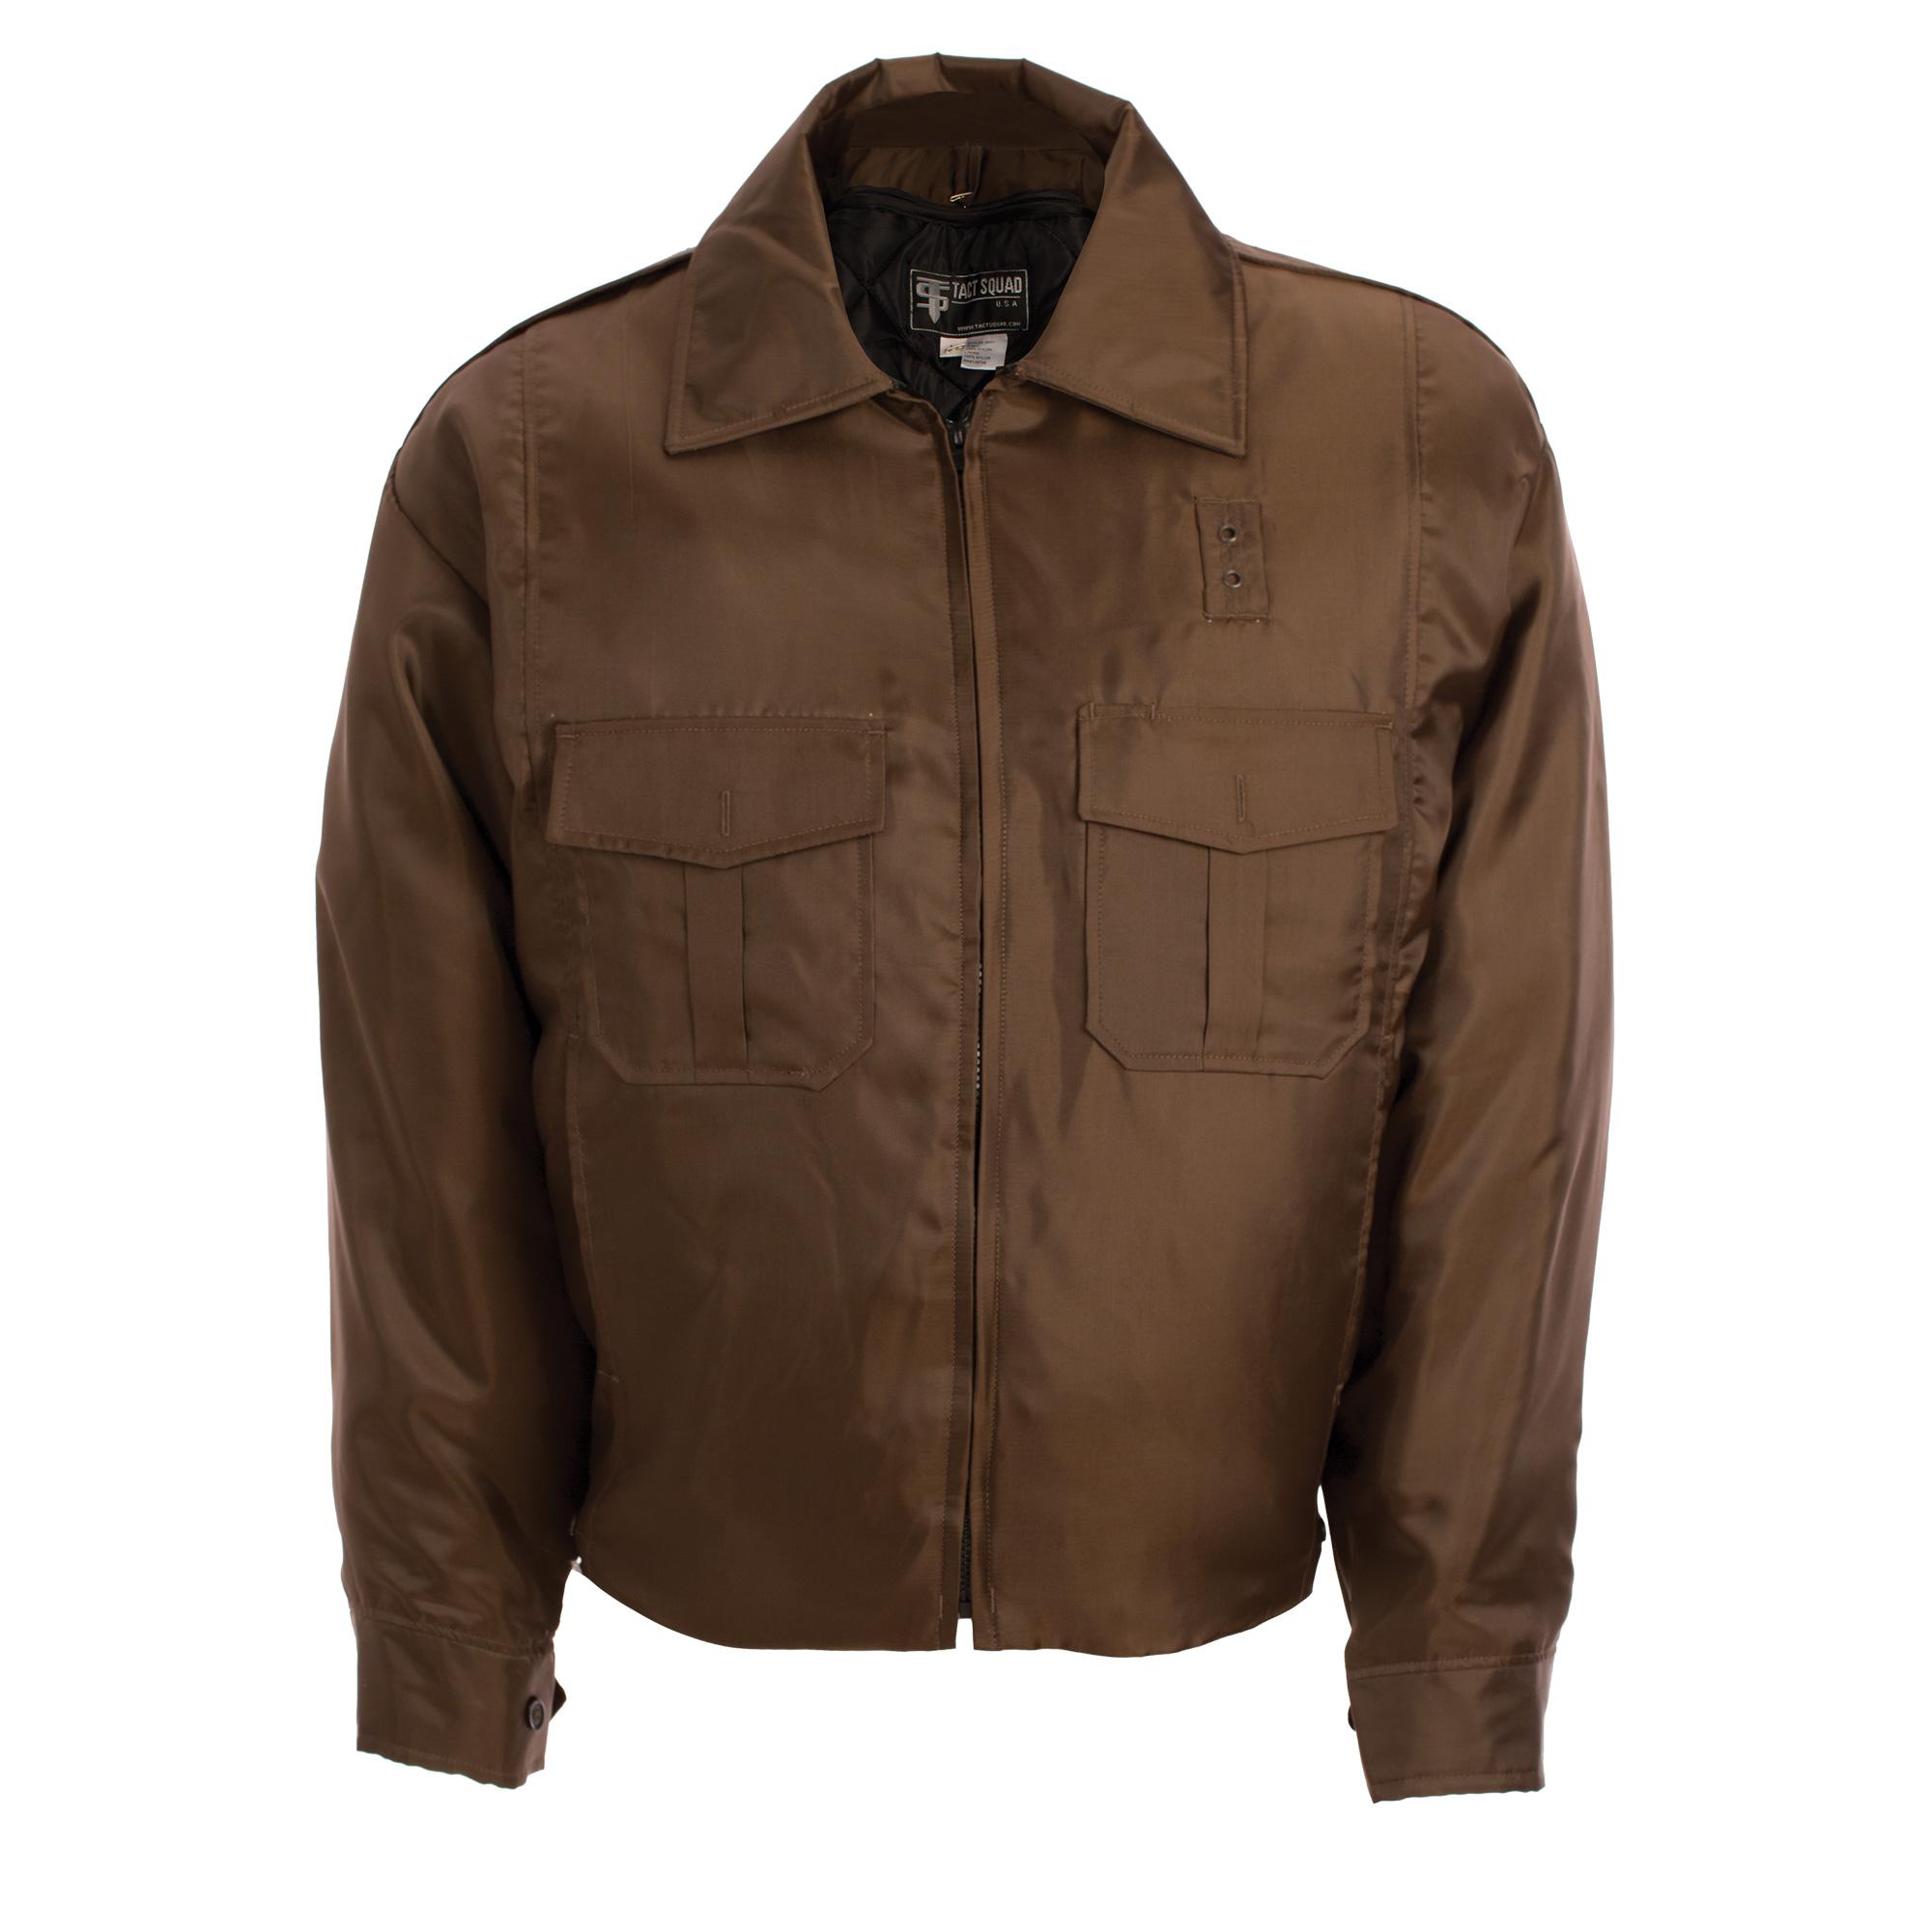 9001 Brown